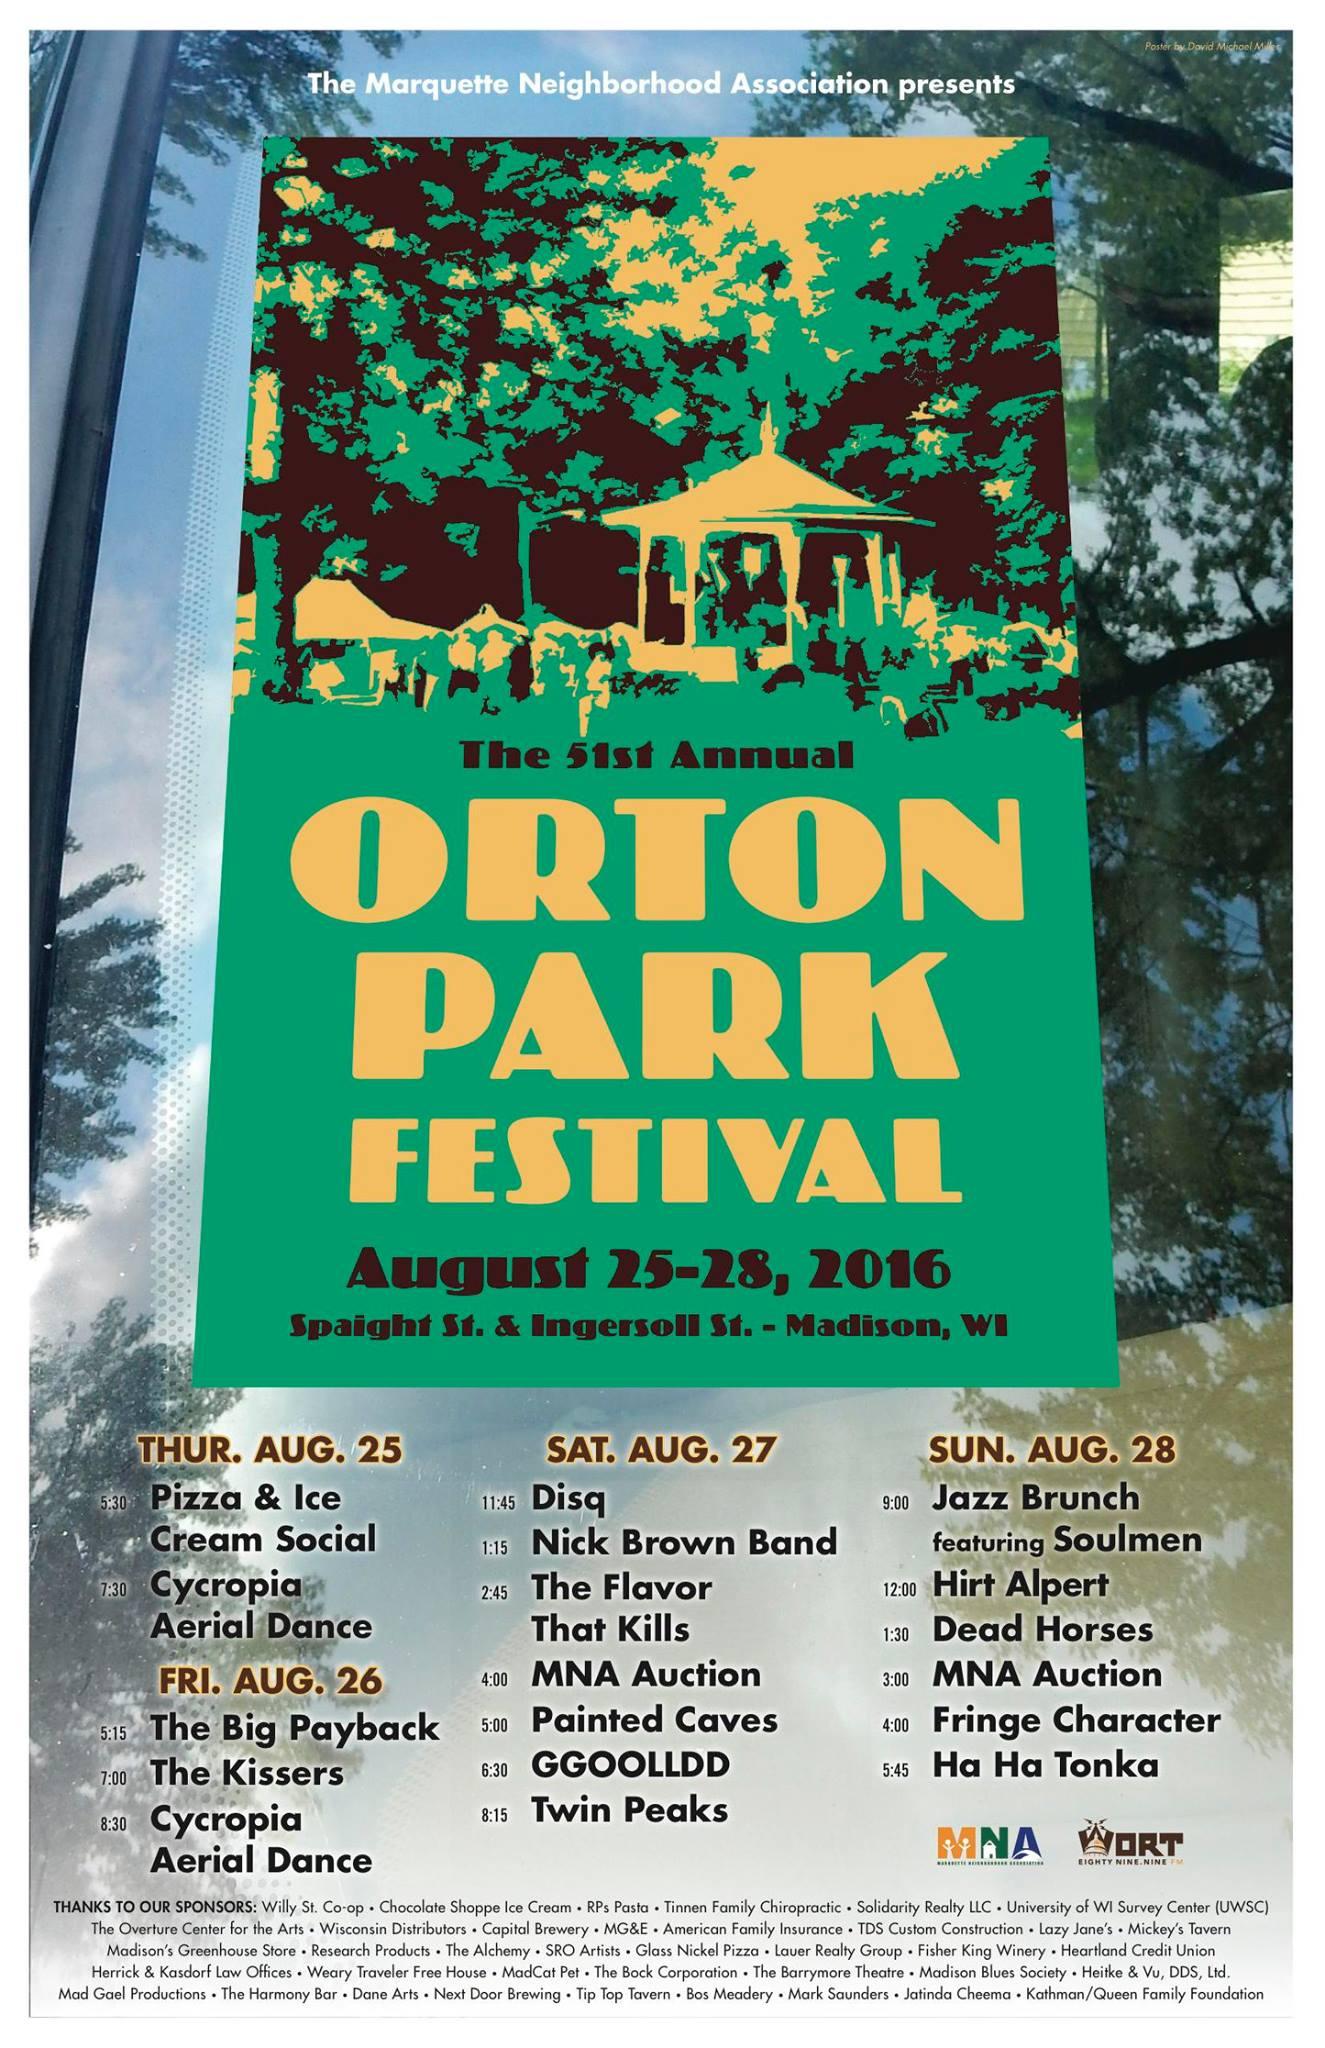 Magic Under Orton Park Oak >> Orton Park Festival August 23 26 2018 Marquette Neighborhood